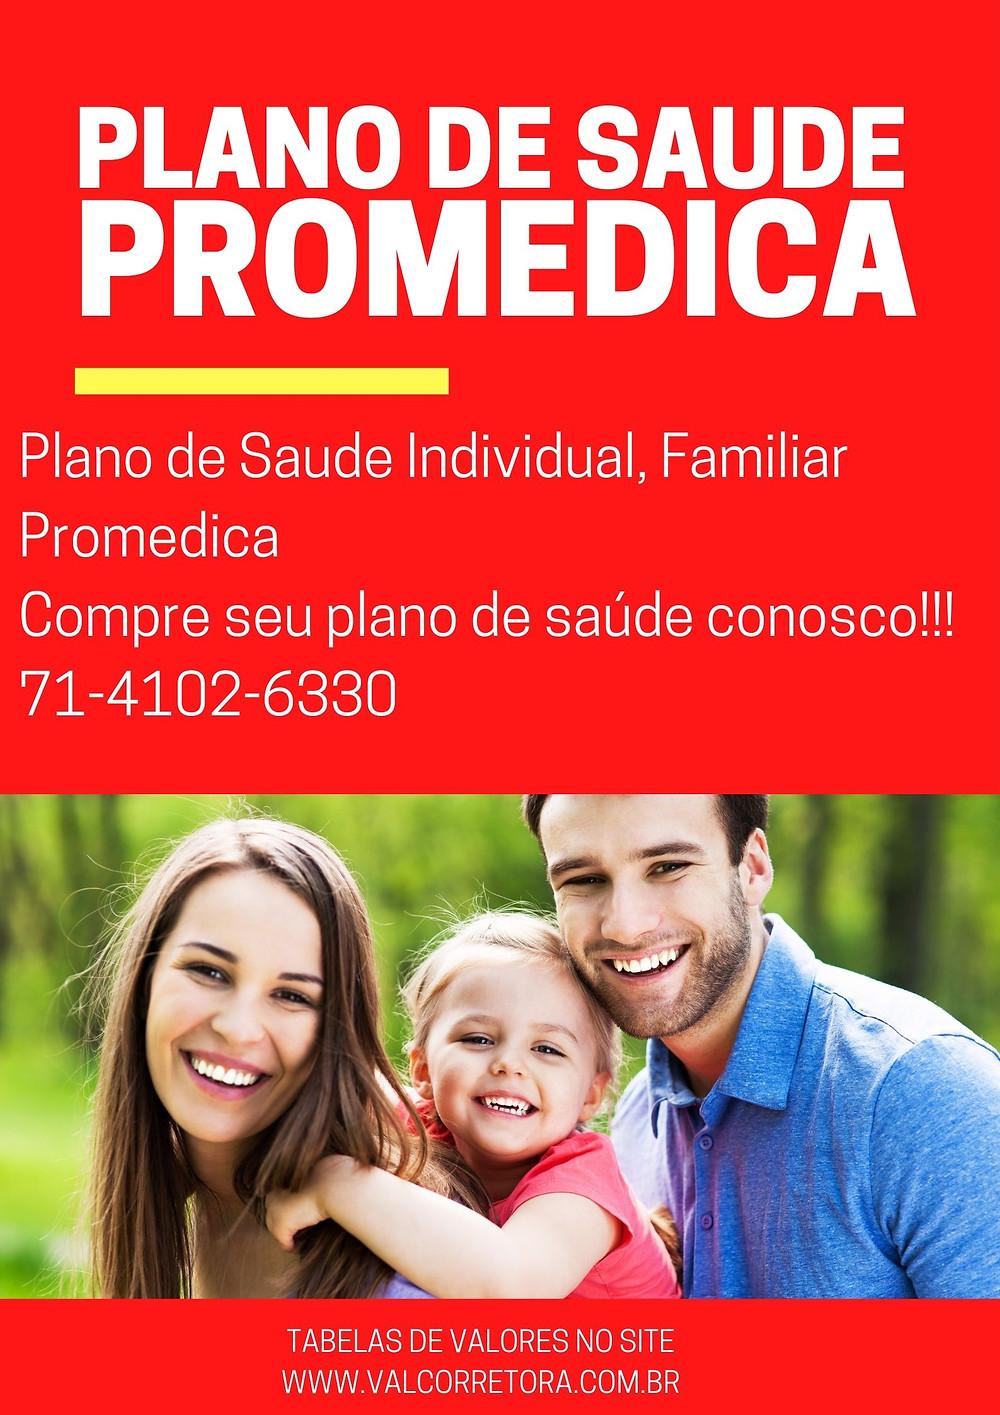 Promedica Plano Individual em Salvador